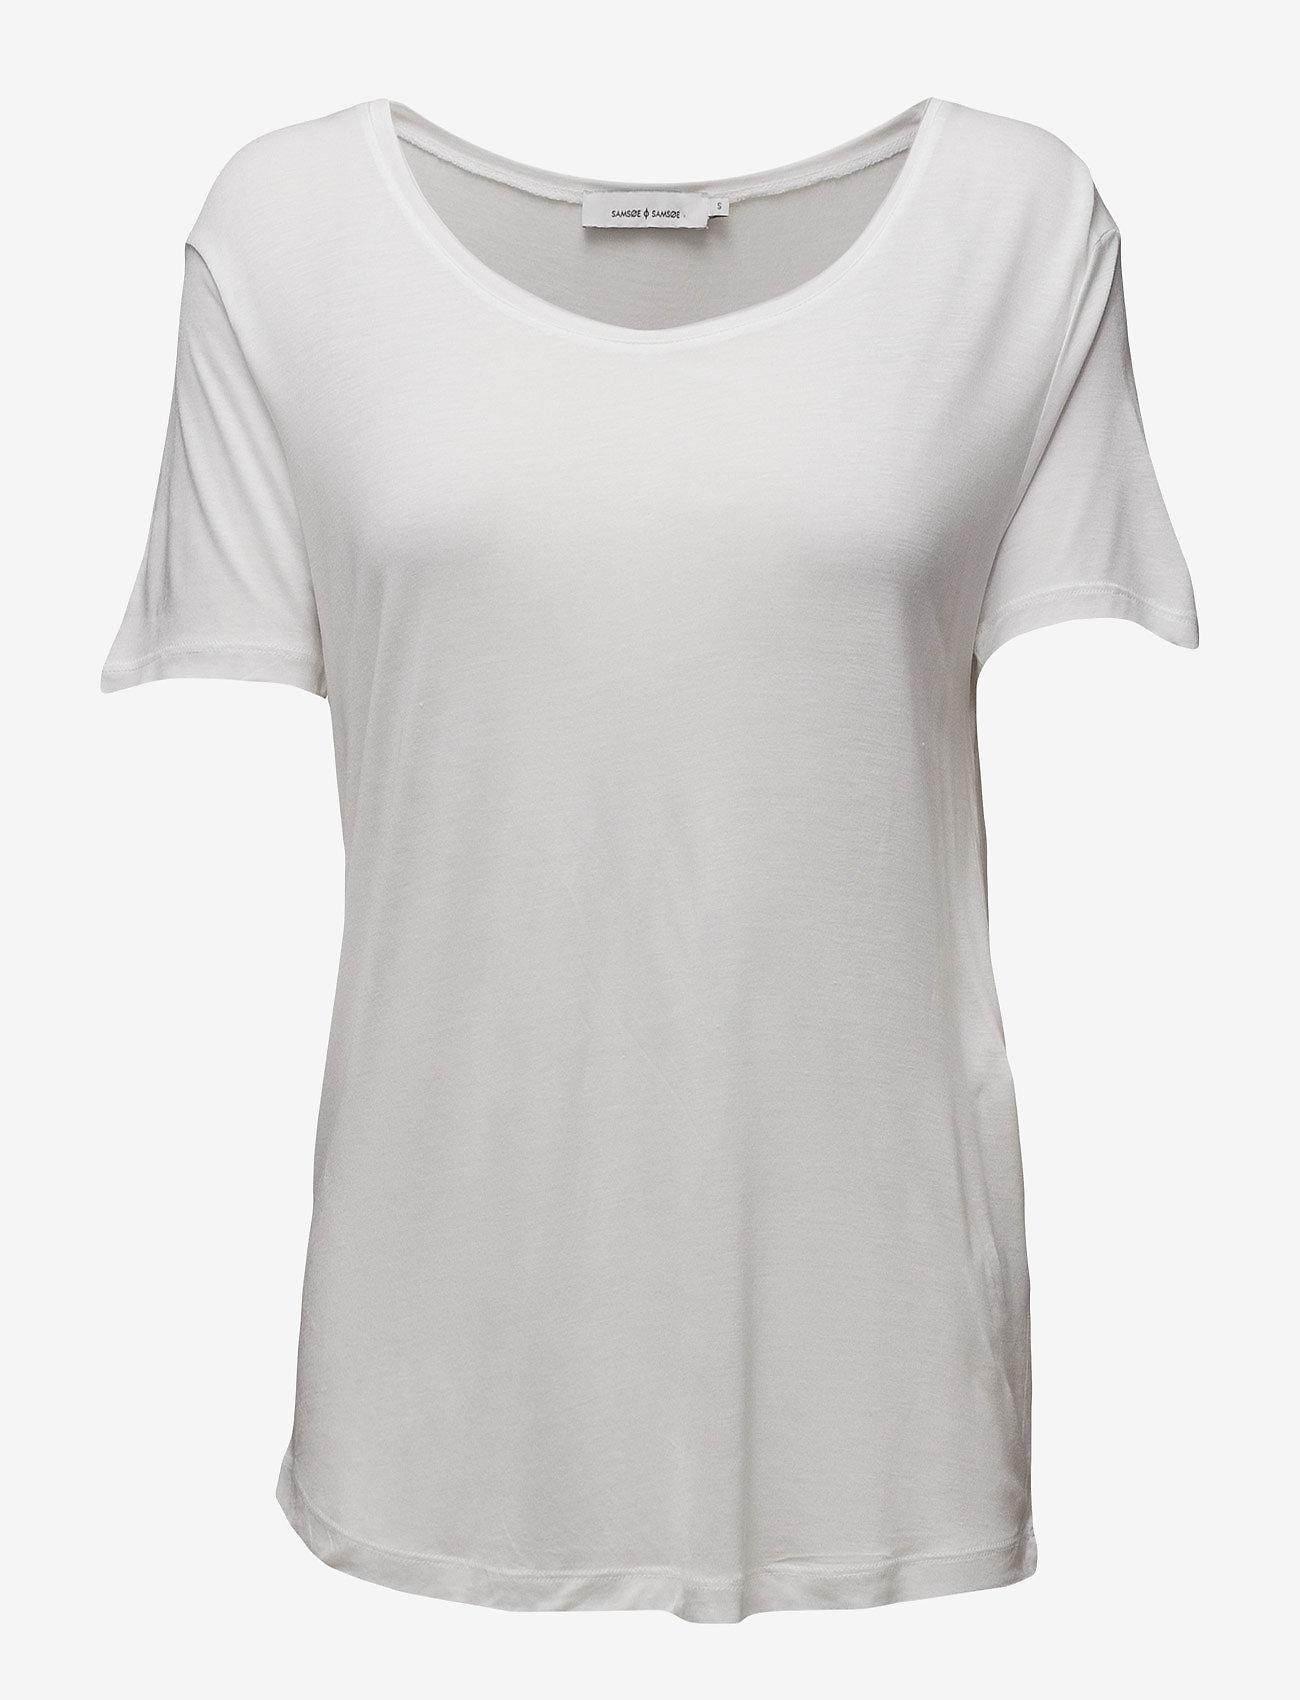 Samsøe Samsøe - Amie ss 2085 - t-shirts & tops - white - 0